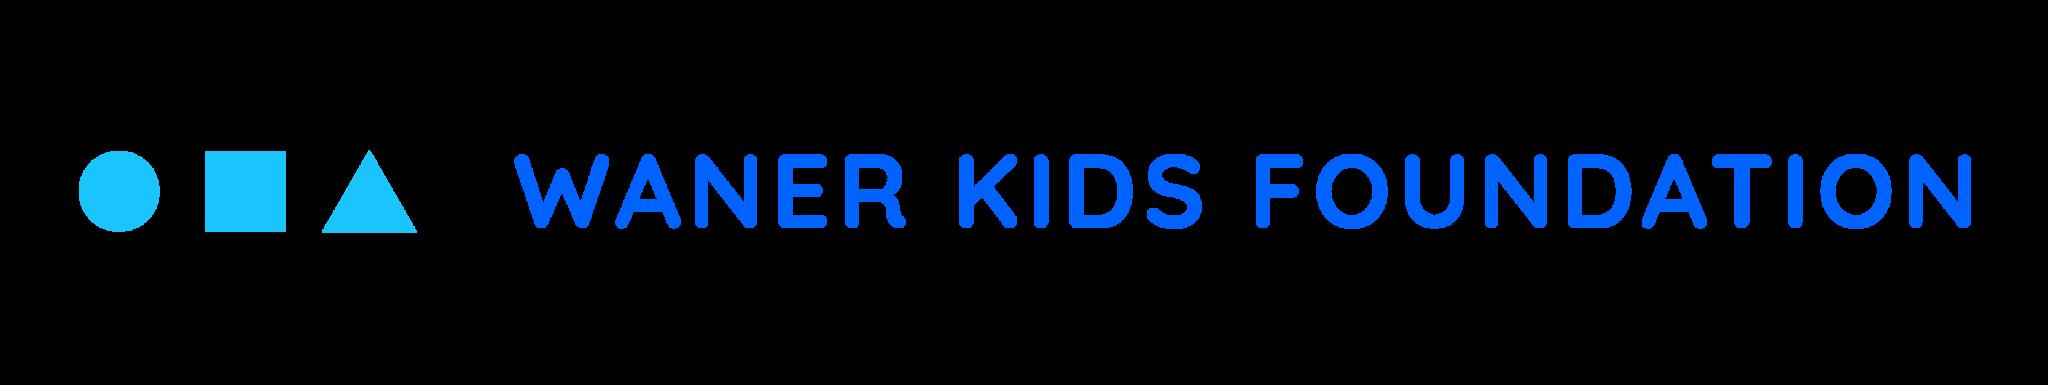 Waner_Kids_Foundation_WKF_Horizontal_Blue